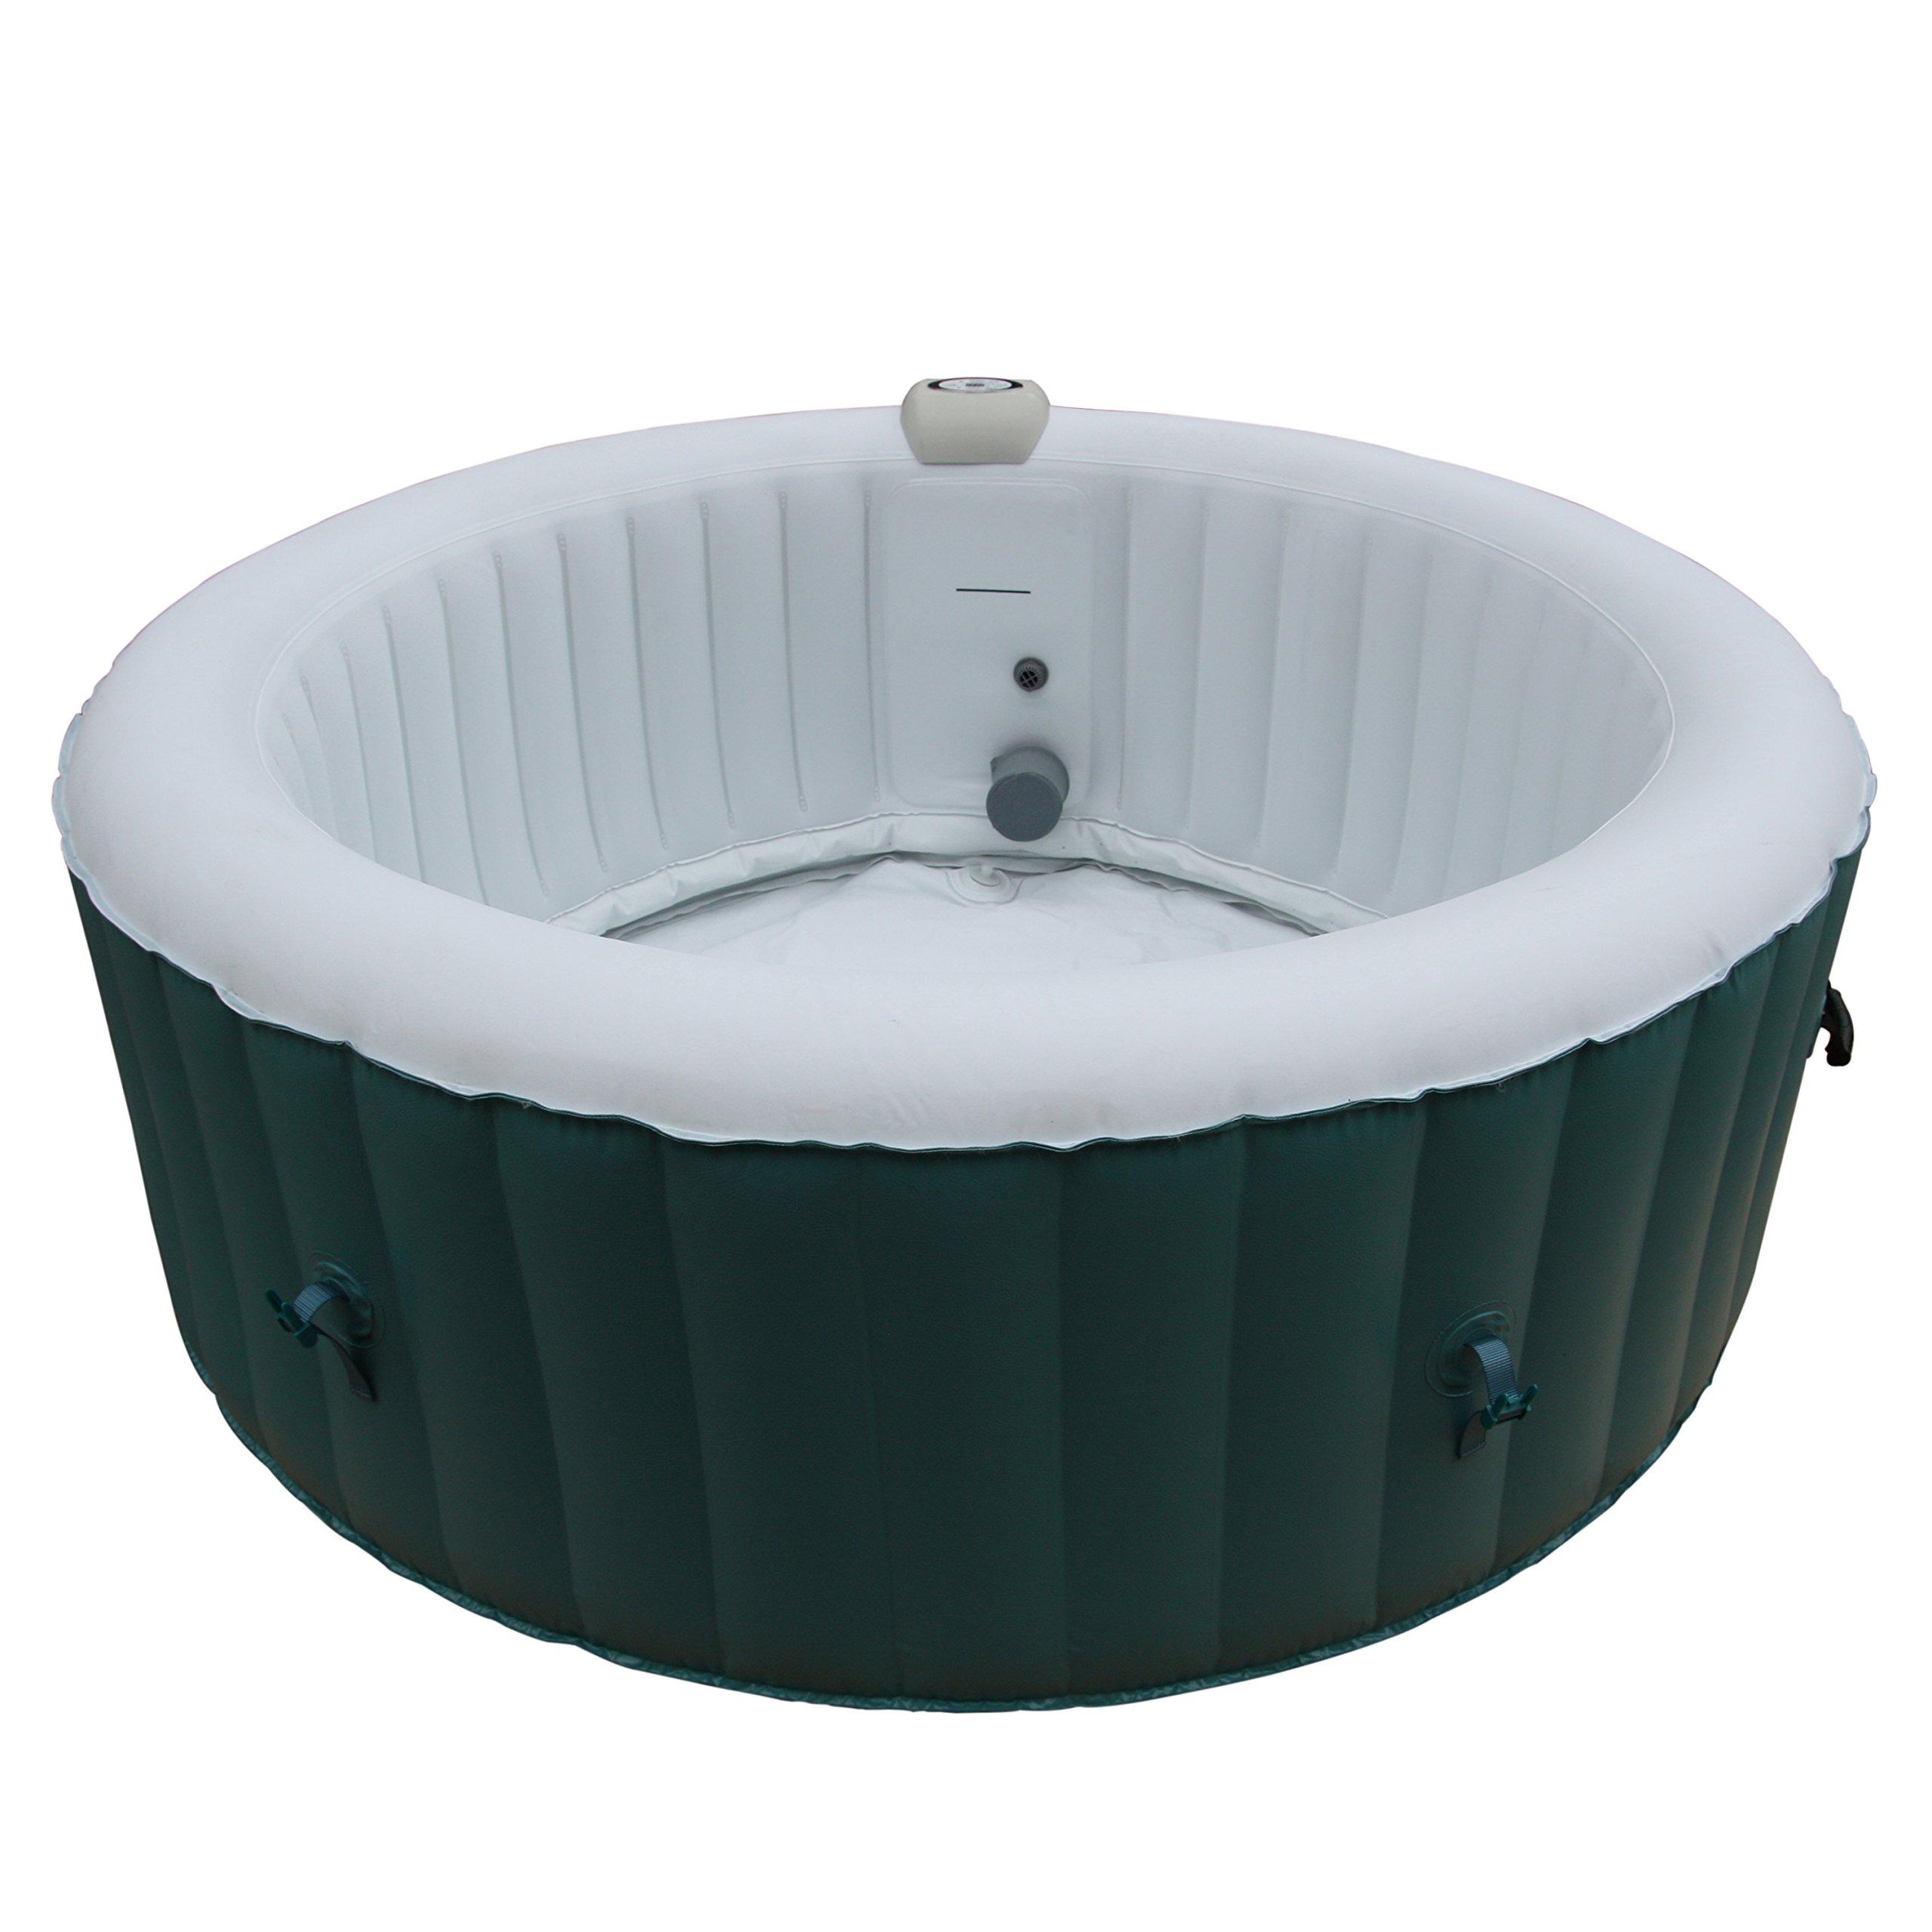 ALEKO HTIR4BLL Round Inflatable Hot Tub Personal Spa, 4 Person, 215 Gallon, Light Blue by ALEKO